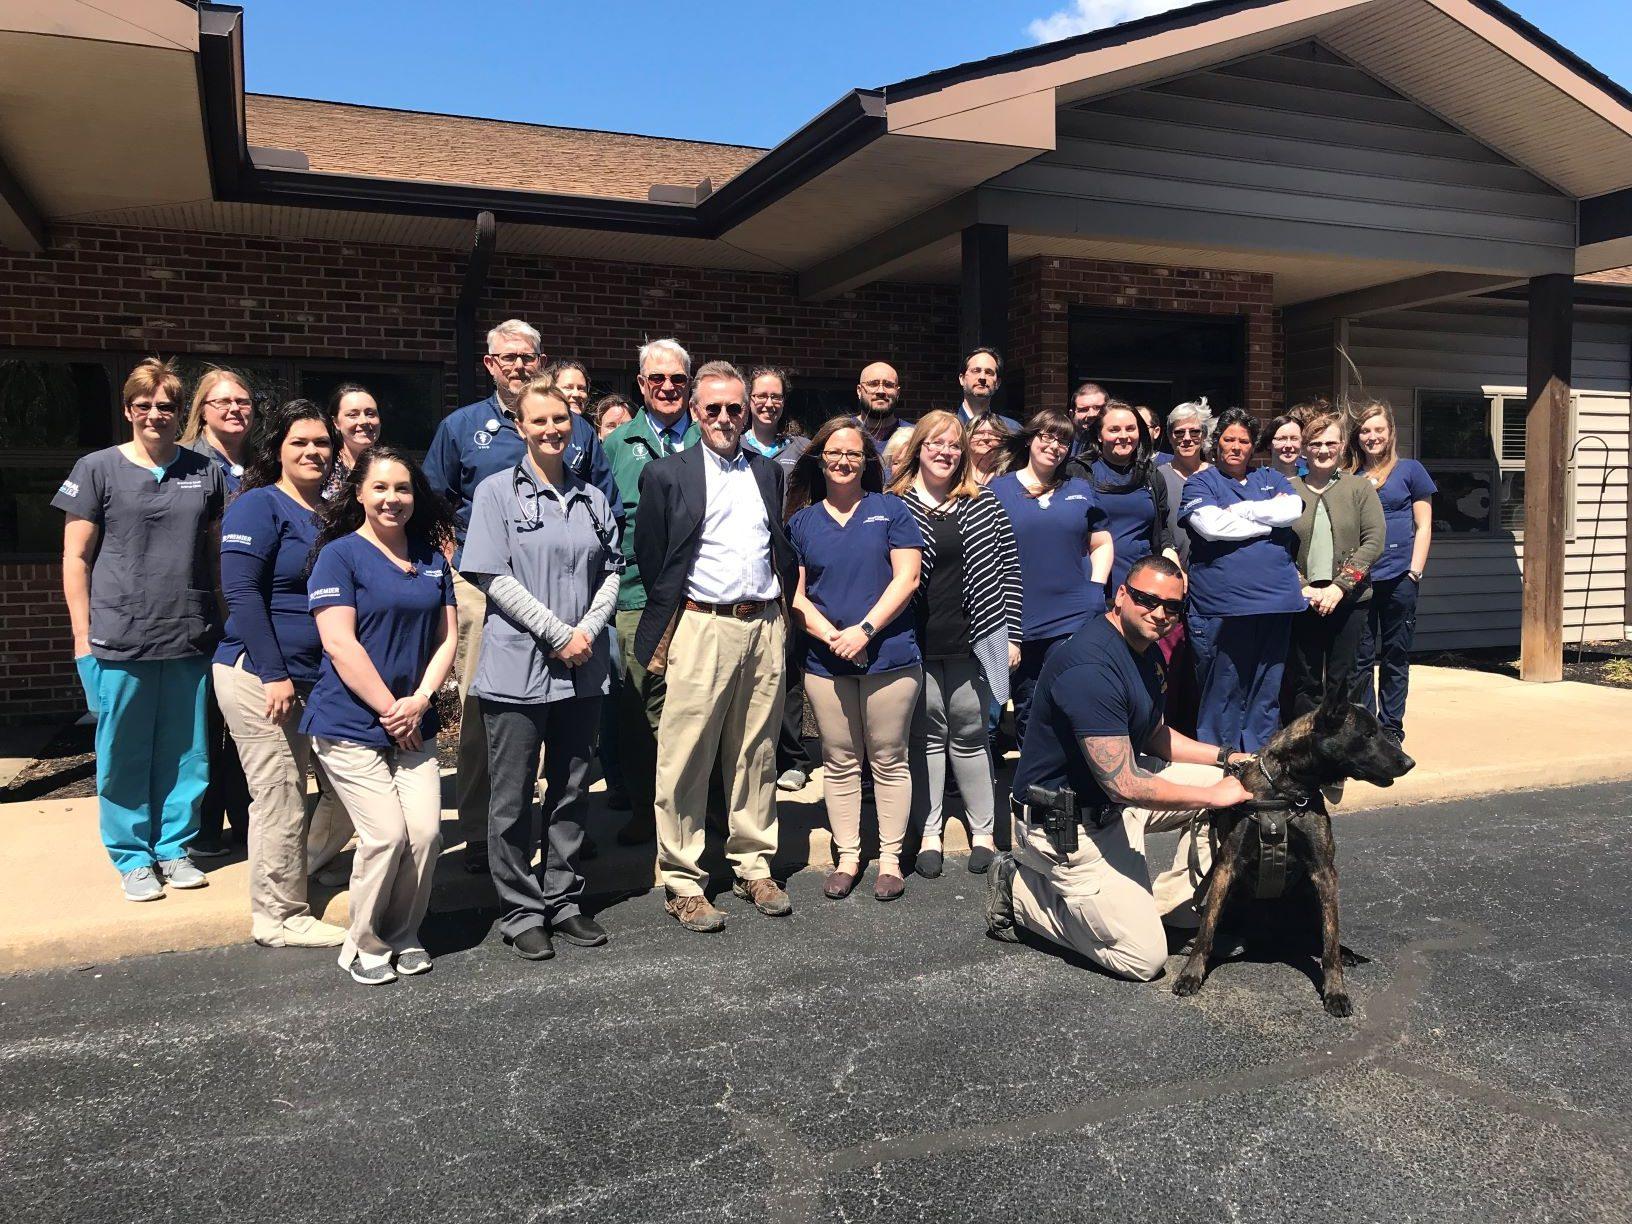 Delaware's Top Rated Local® Veterinarians Award Winner: Brenford Animal Hospital